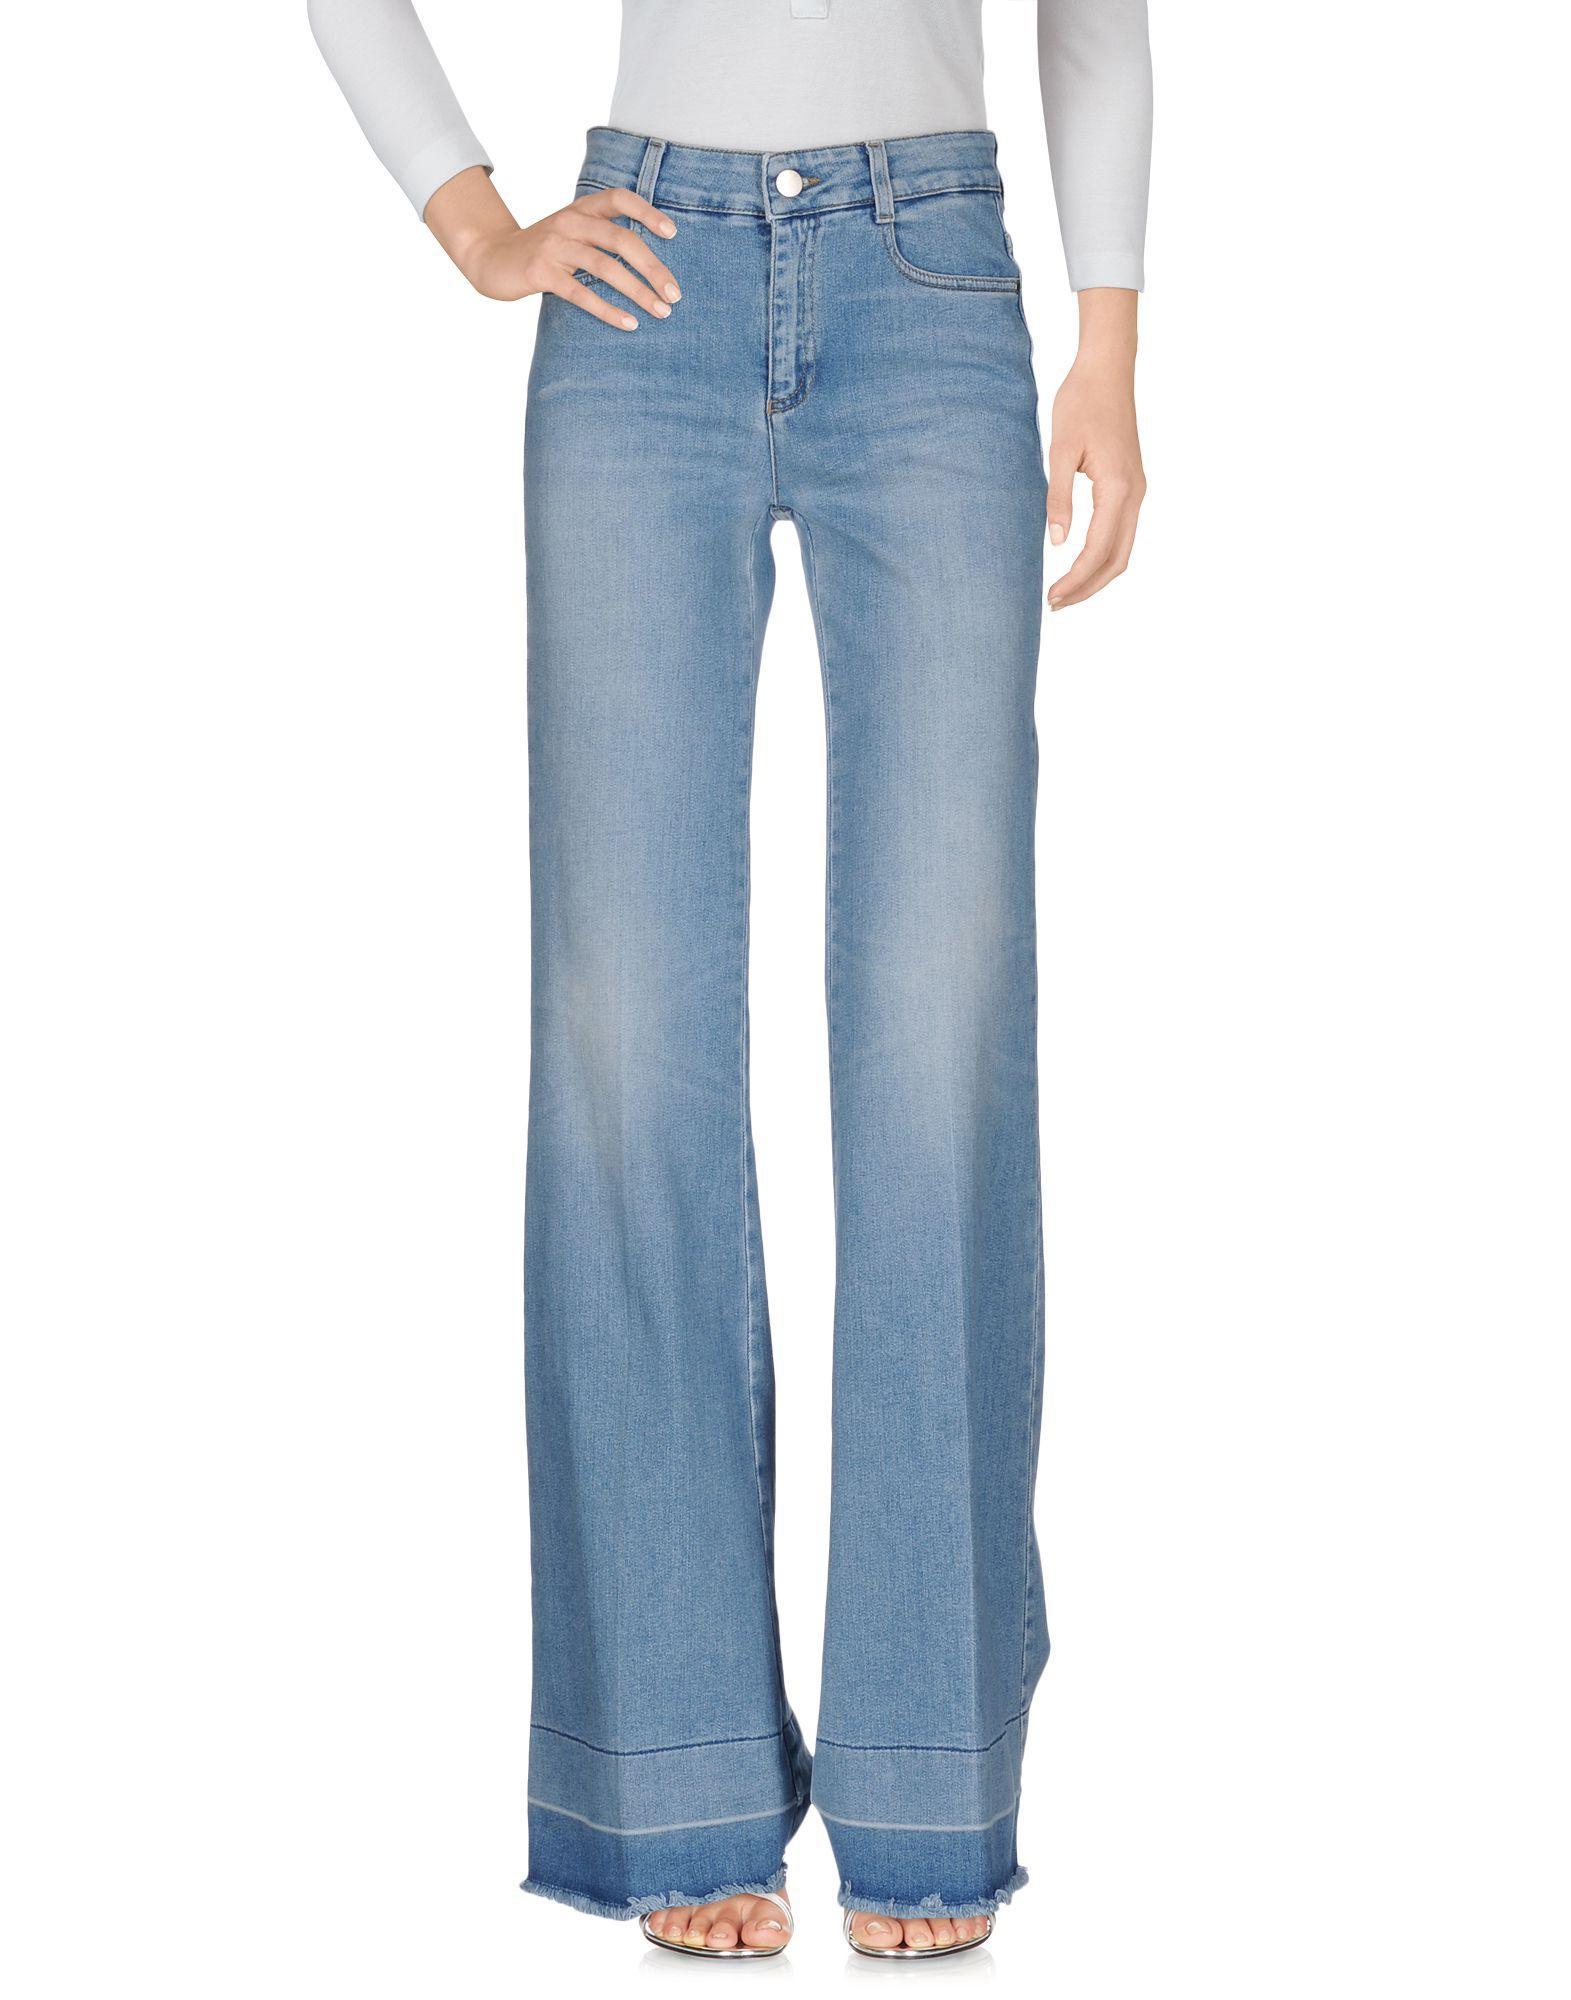 Pantaloni Jeans Stella Mccartney Donna - Acquista online su tWnwly4dqE